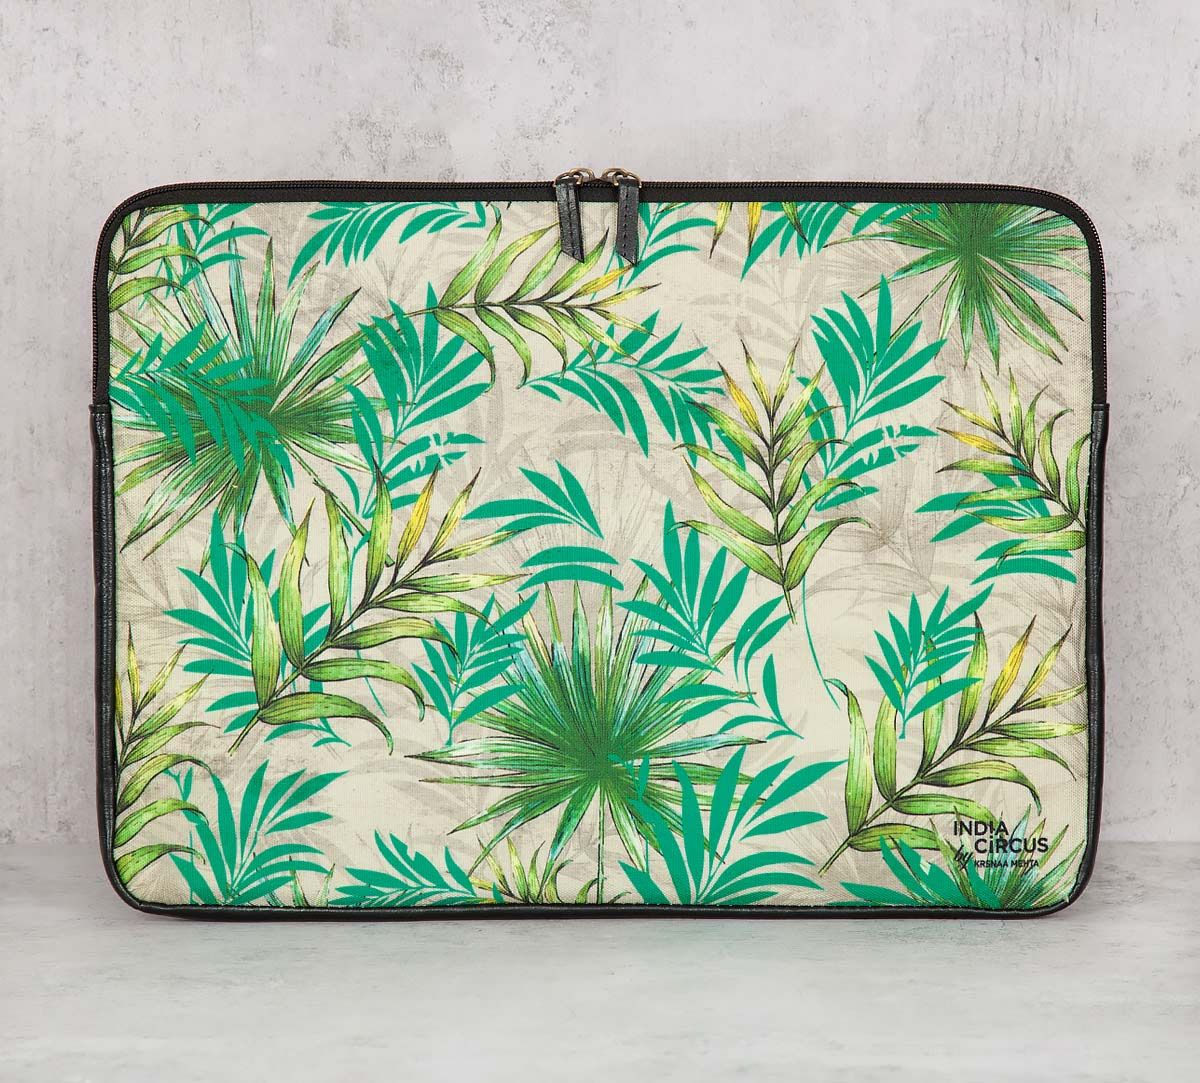 India Circus Tropical Fall Laptop Sleeve